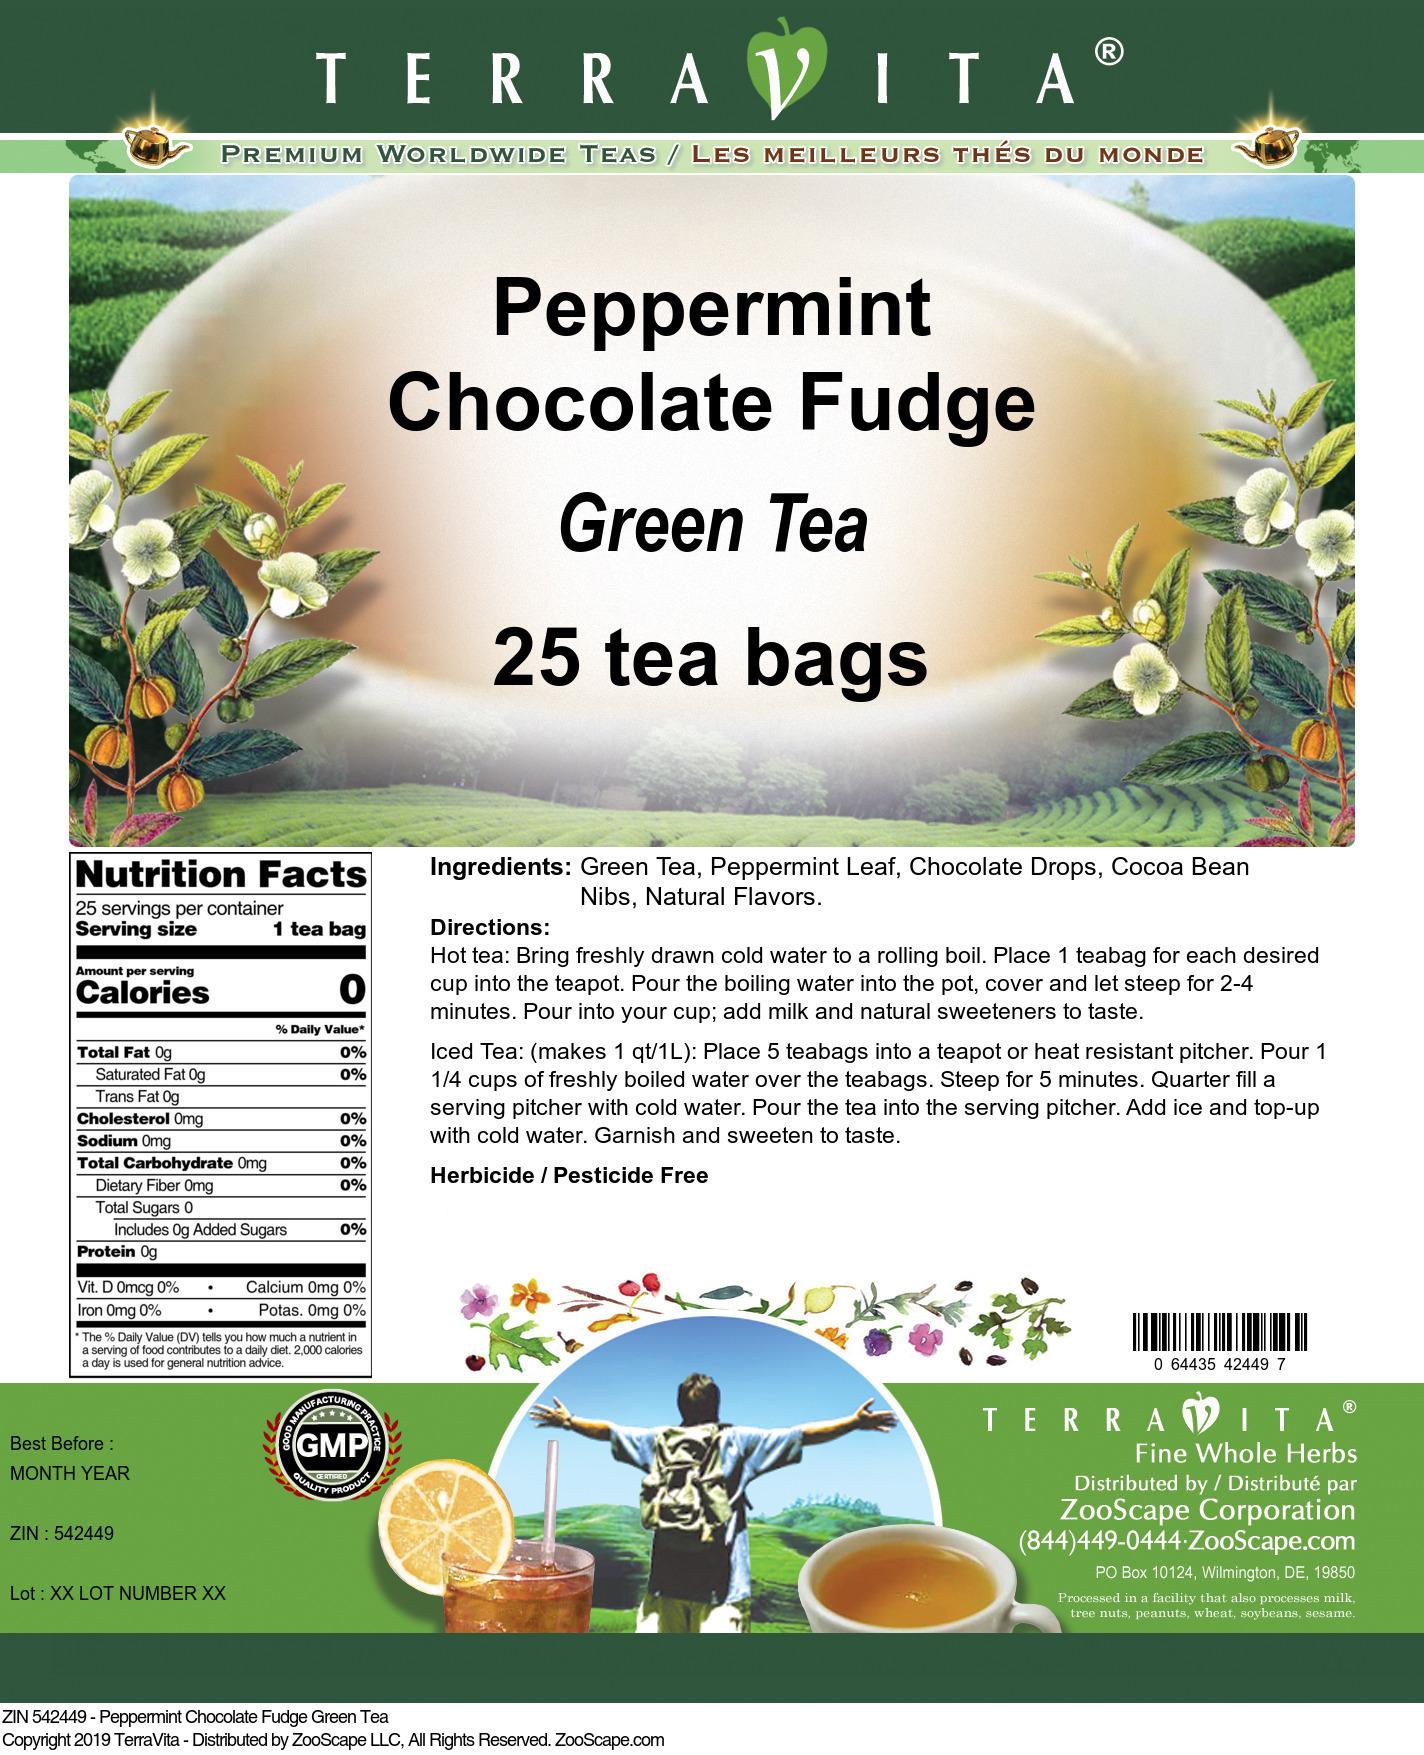 Peppermint Chocolate Fudge Green Tea